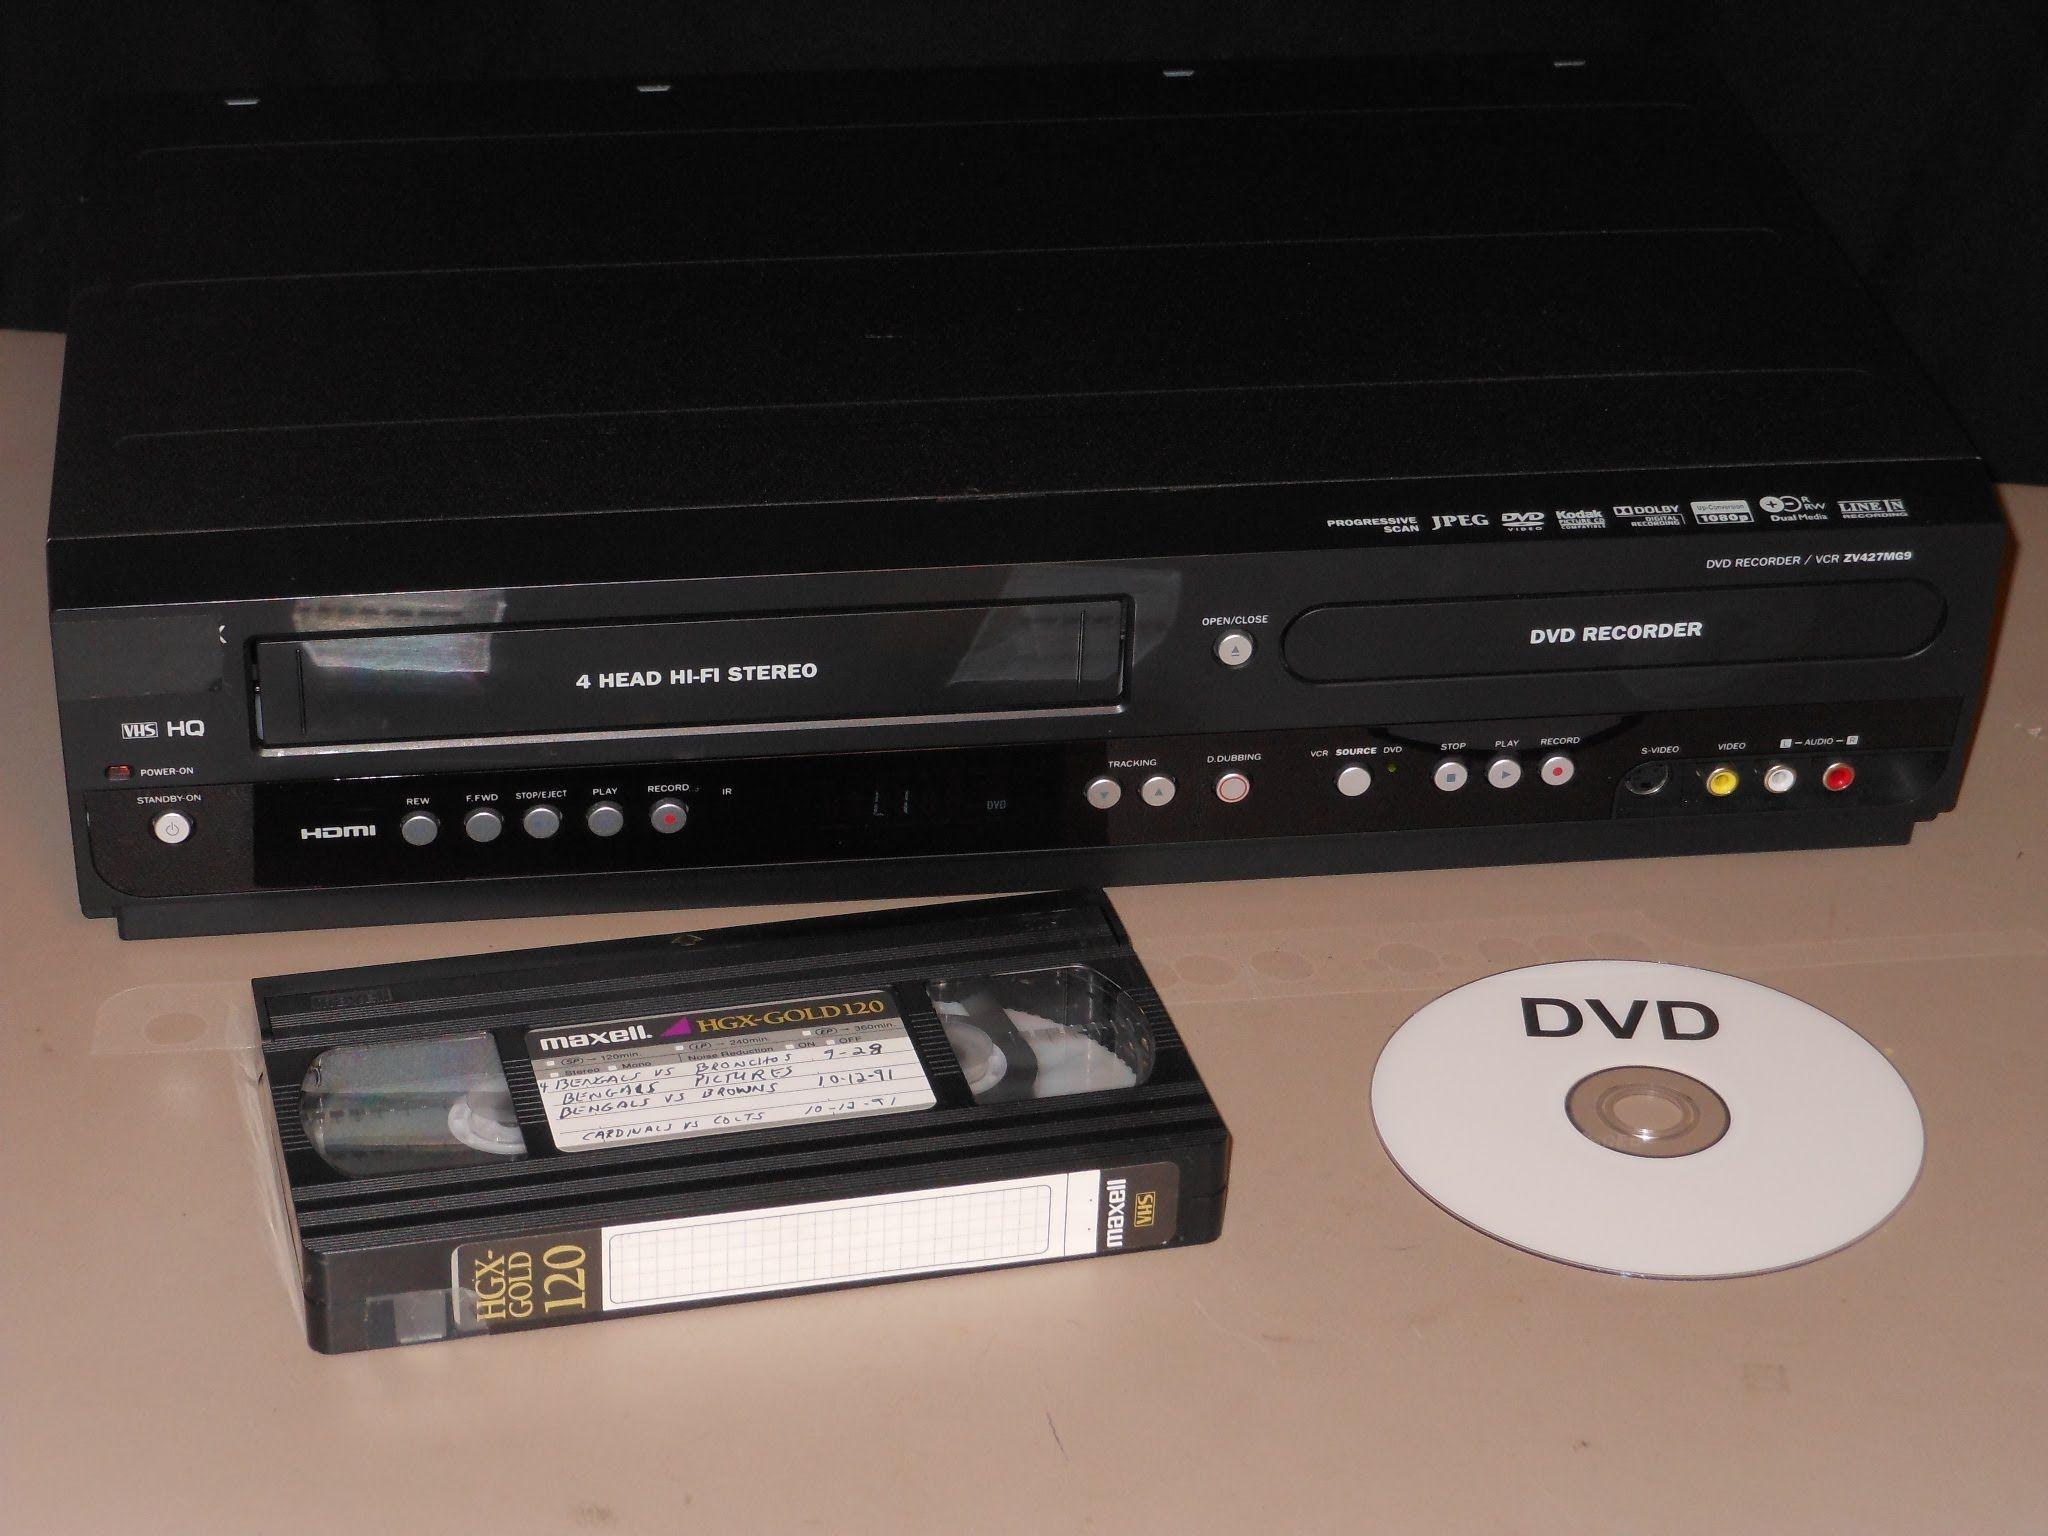 vhs transfer to dvd using combo recorder makerspace pinterest rh pinterest com Sharp VCR GE VCR